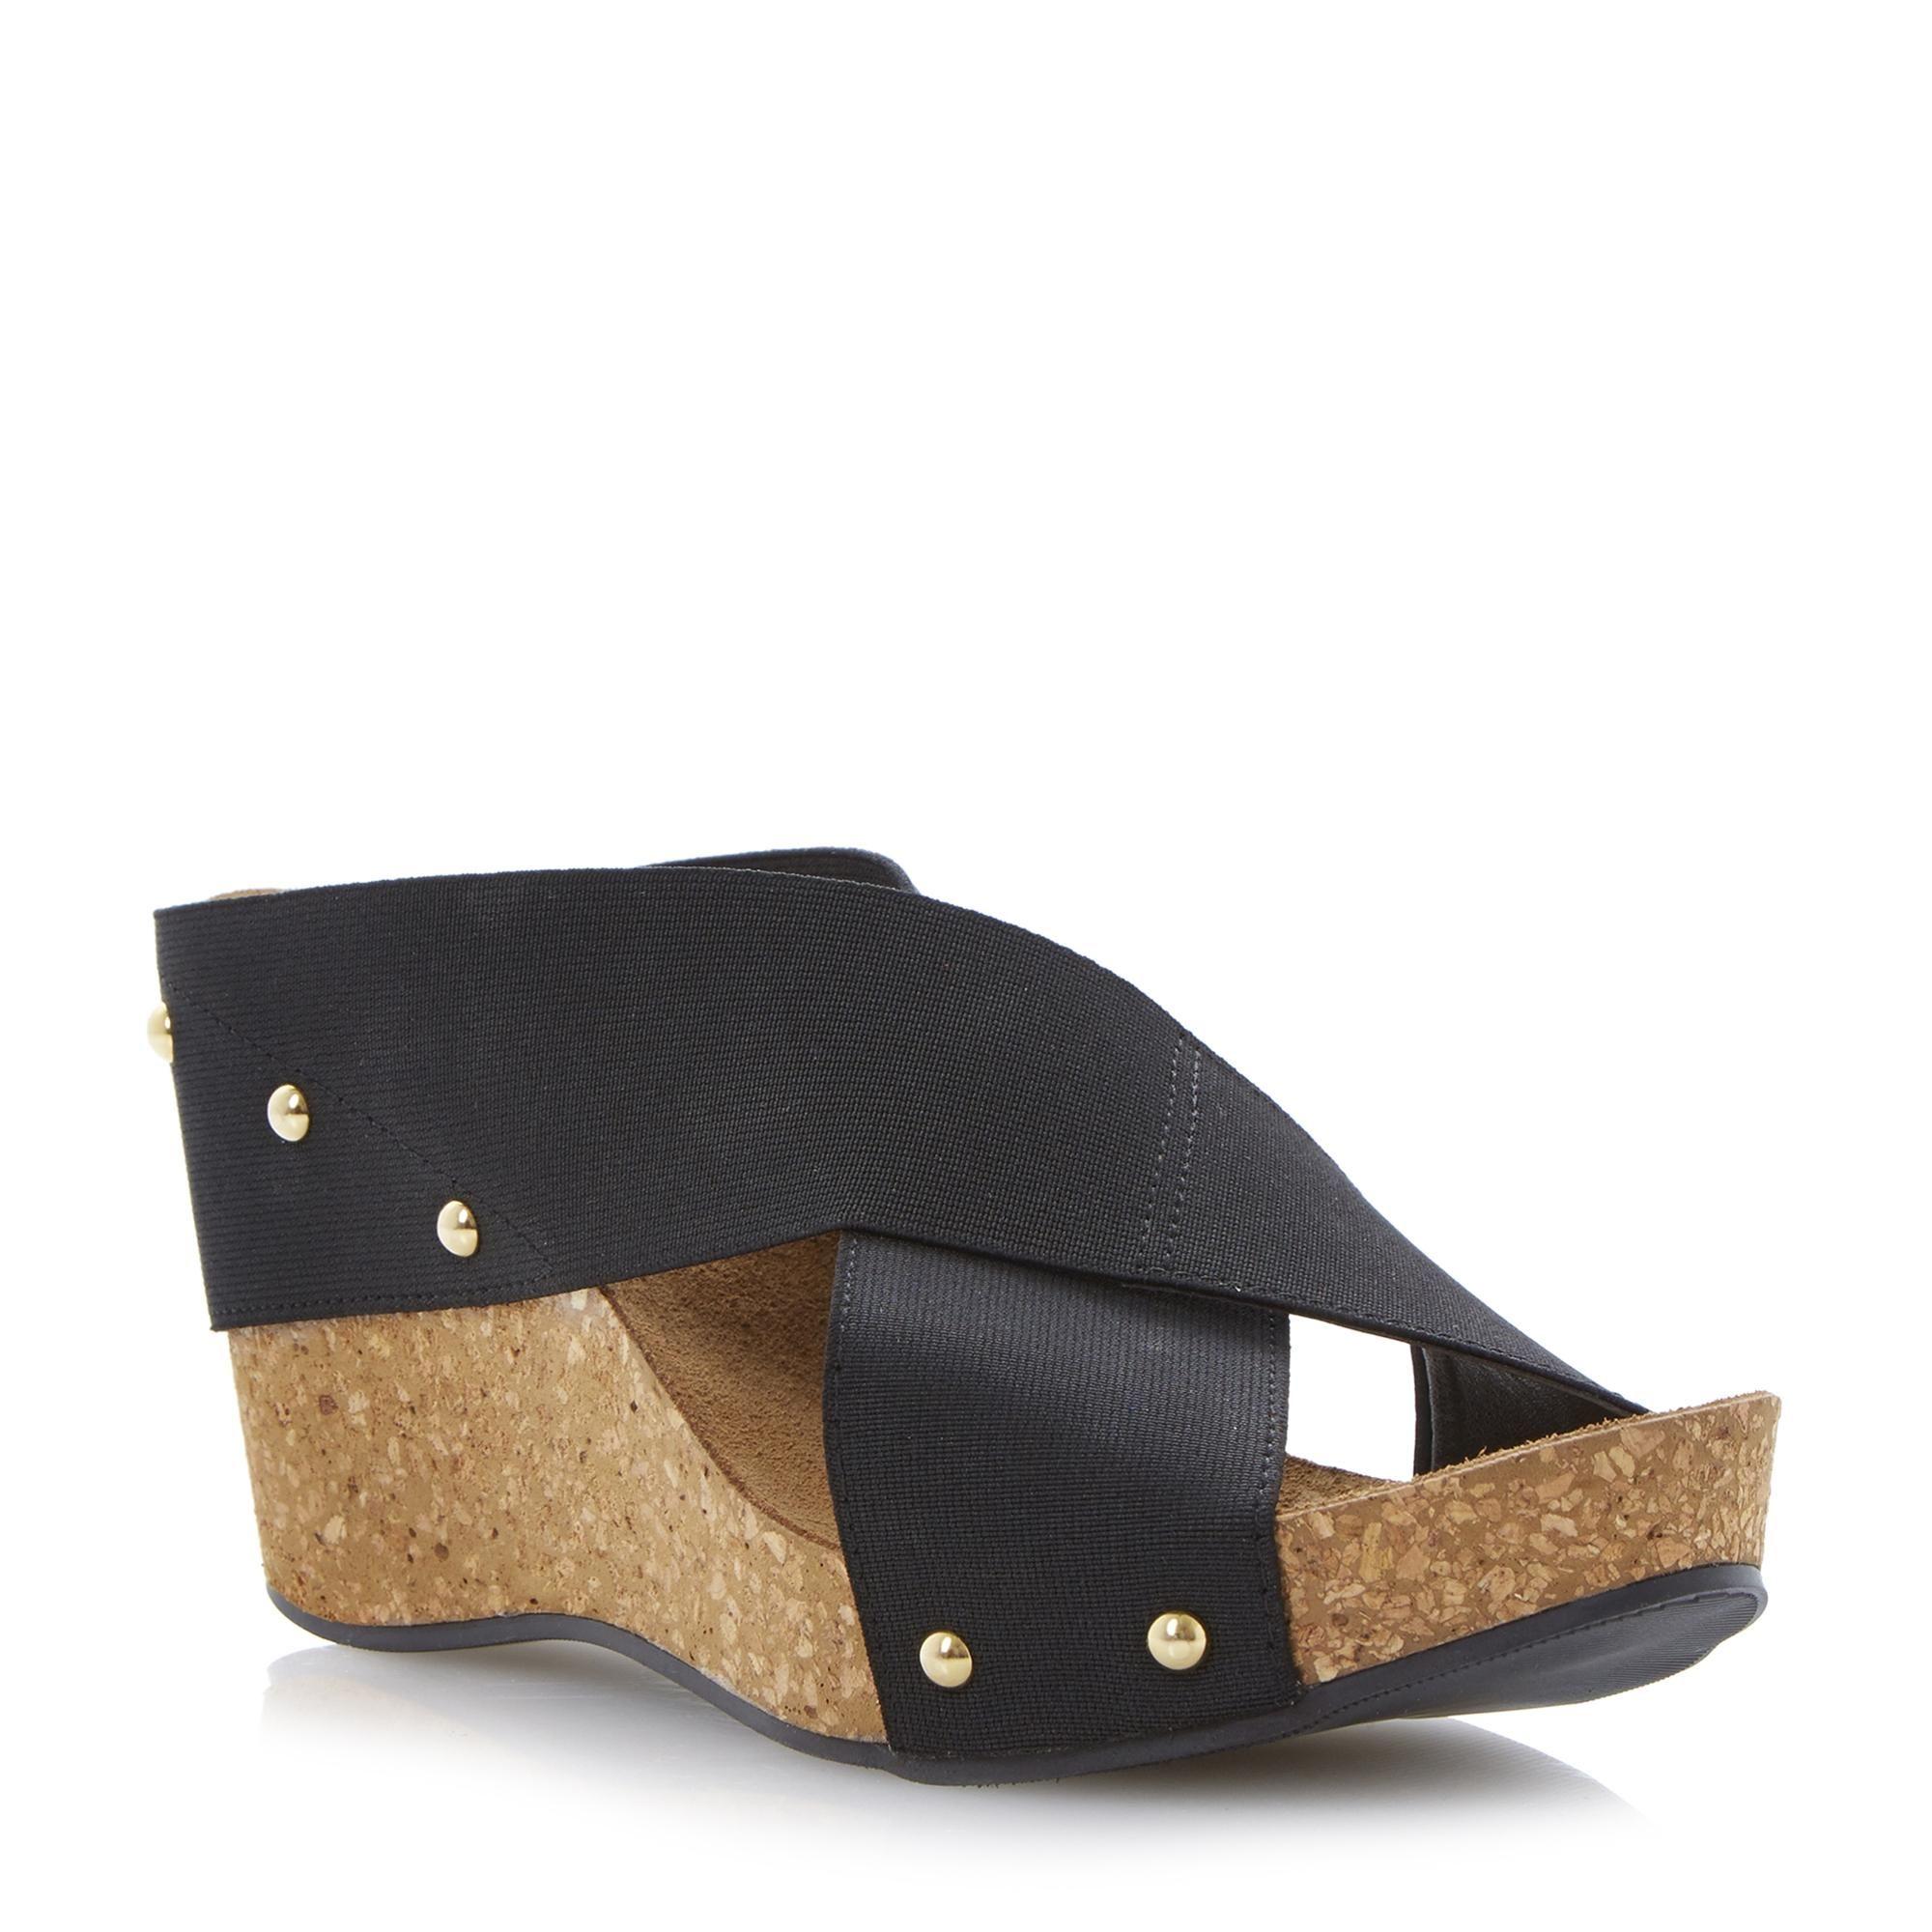 Black sandals dune - Dune Ladies Gladley Elasticated Crossover Strap Wedge Sandal Black Dune Shoes Online